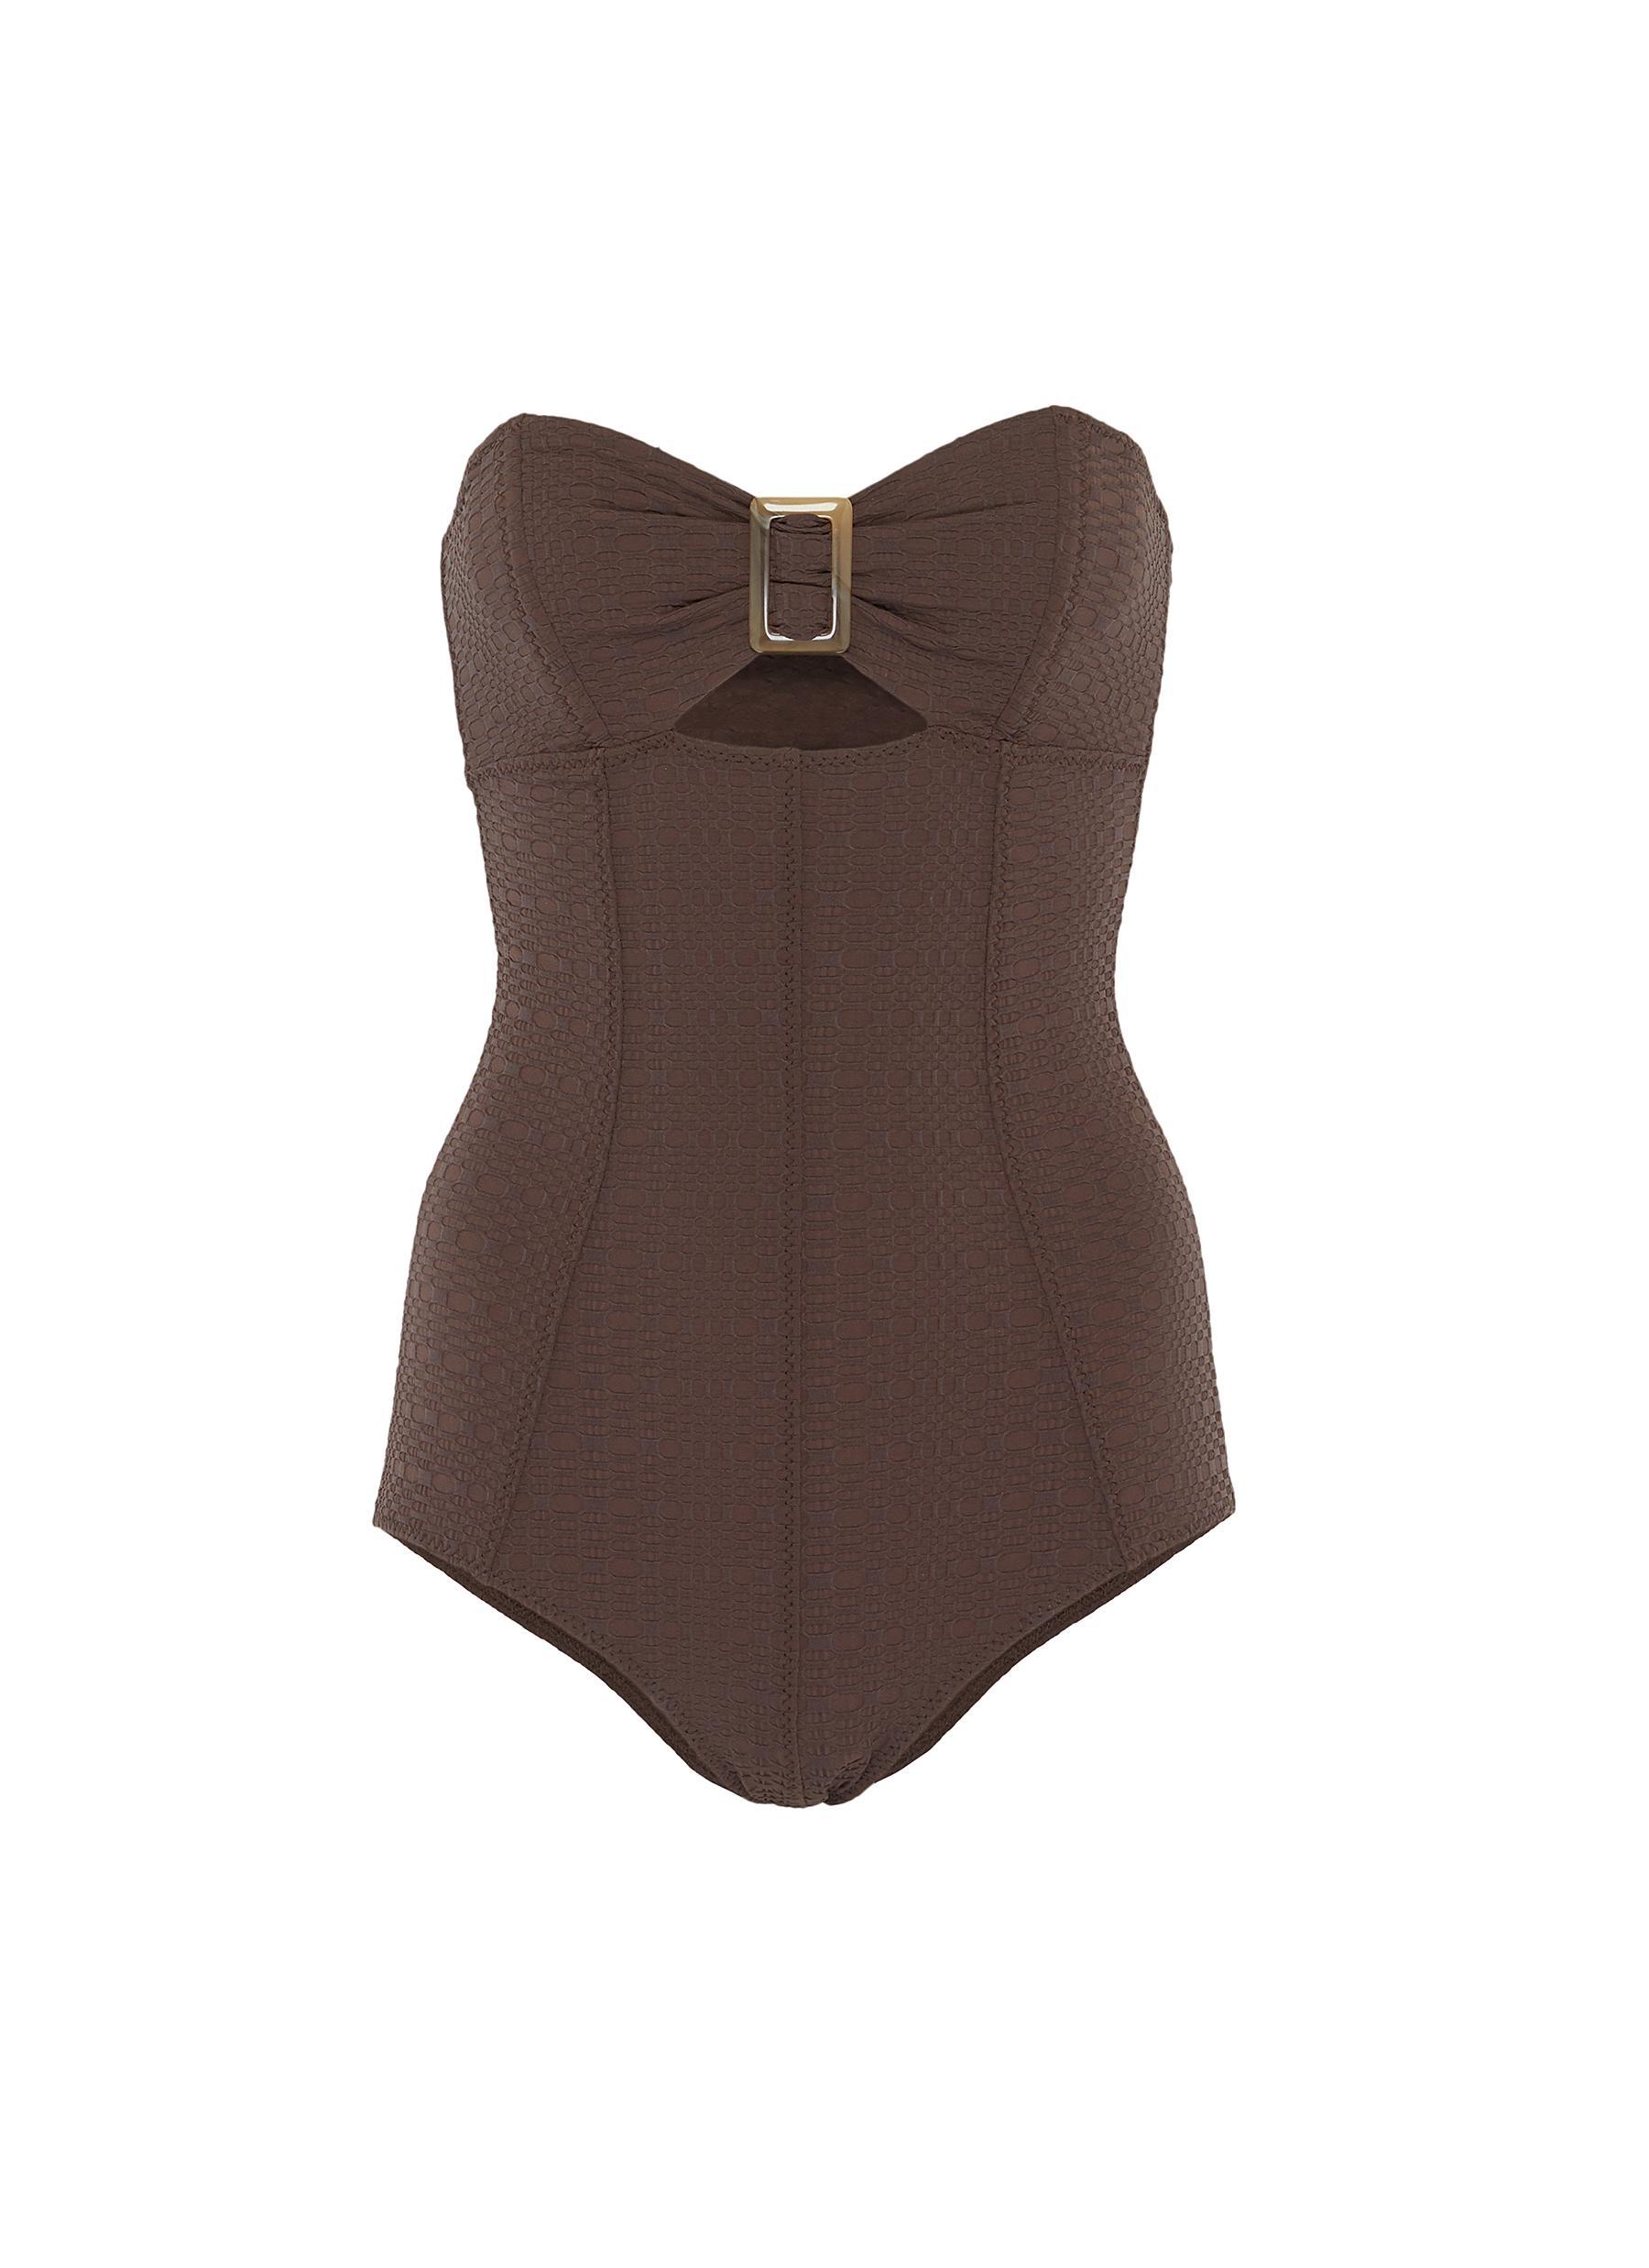 Buy Lisa Marie Fernandez Swimwear Buckled bandeau maillot